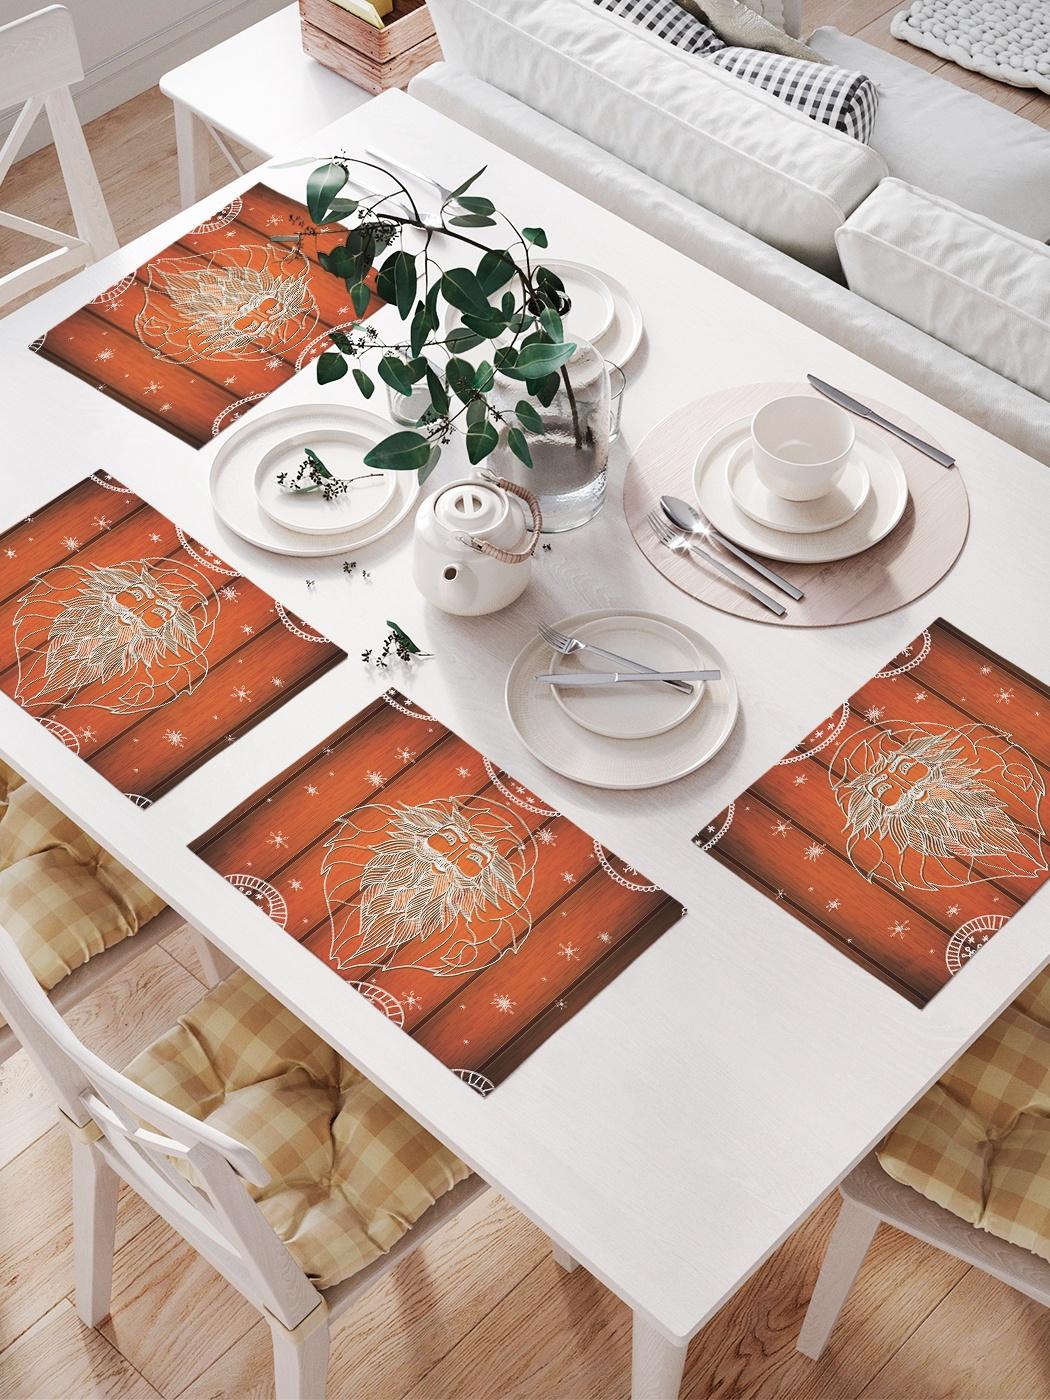 Комплект салфеток для сервировки стола «Дух рождества» (32х46 см, 4 шт.)